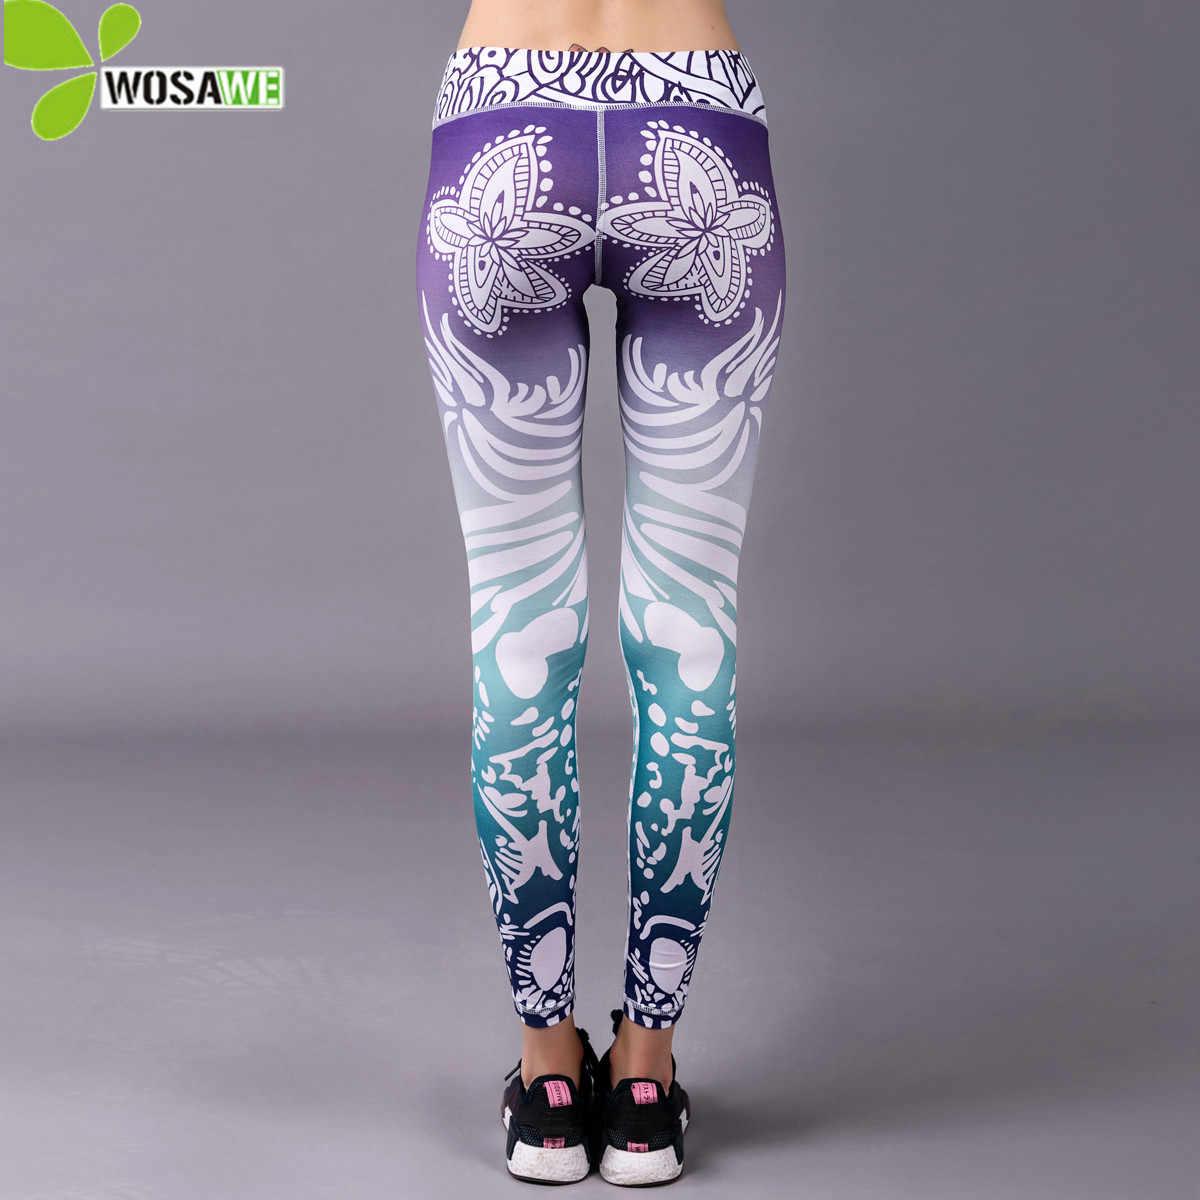 BARBOK נשים כושר יוגה מכנסיים Slim גרביונים ריצה ספורט חדר כושר אימון מכנסיים חלקה בטן בקרת ספורט חותלות